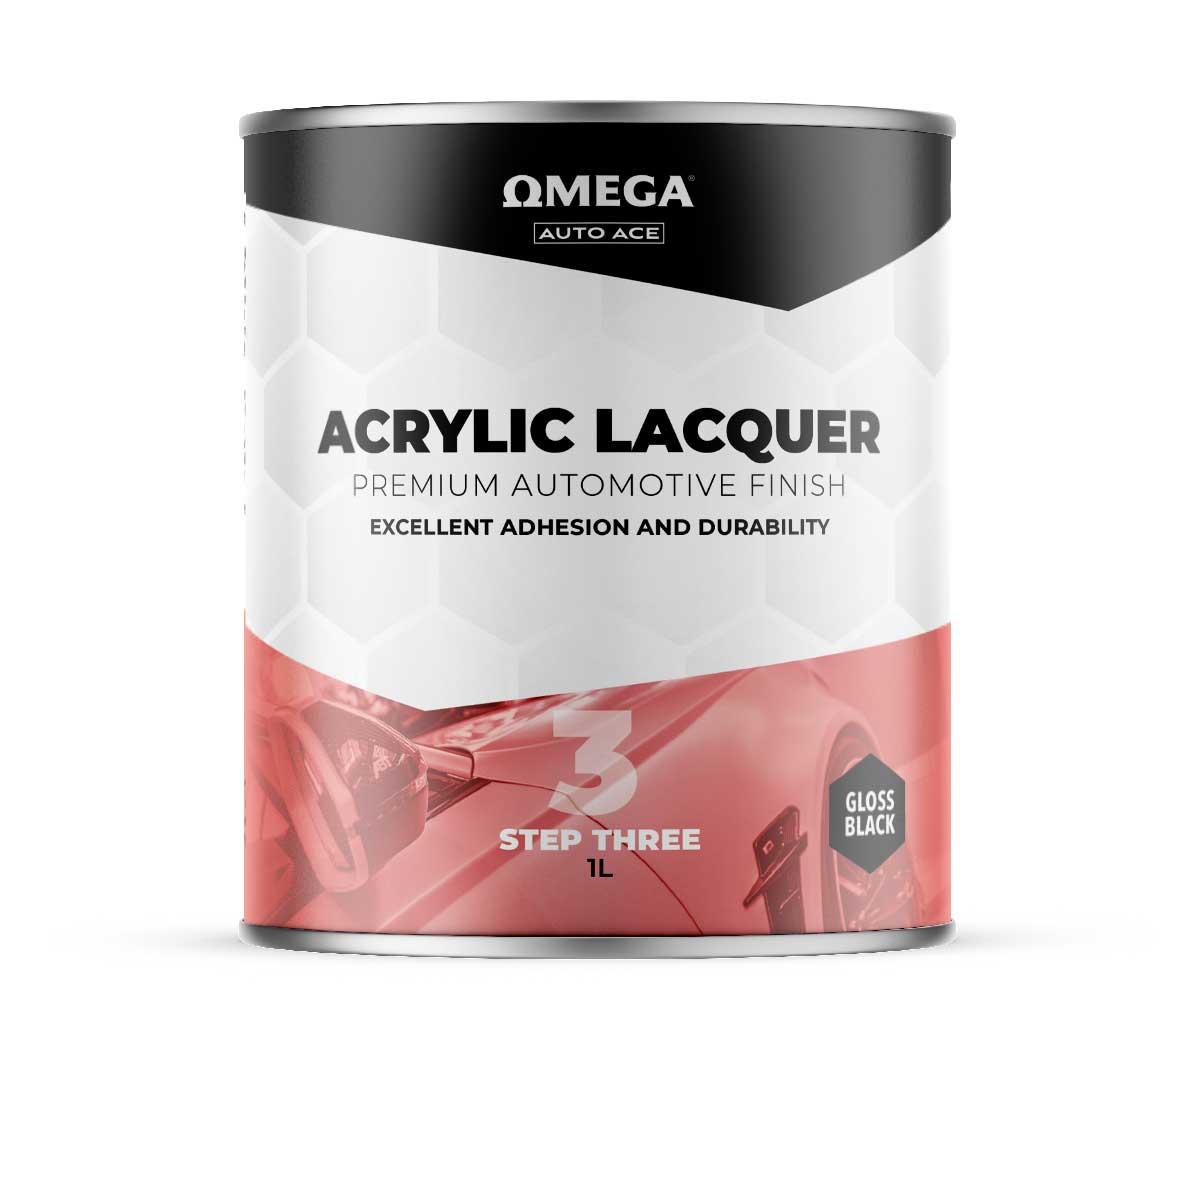 Omega Auto Ace Acrylic Lacquer Gloss Black 1lt